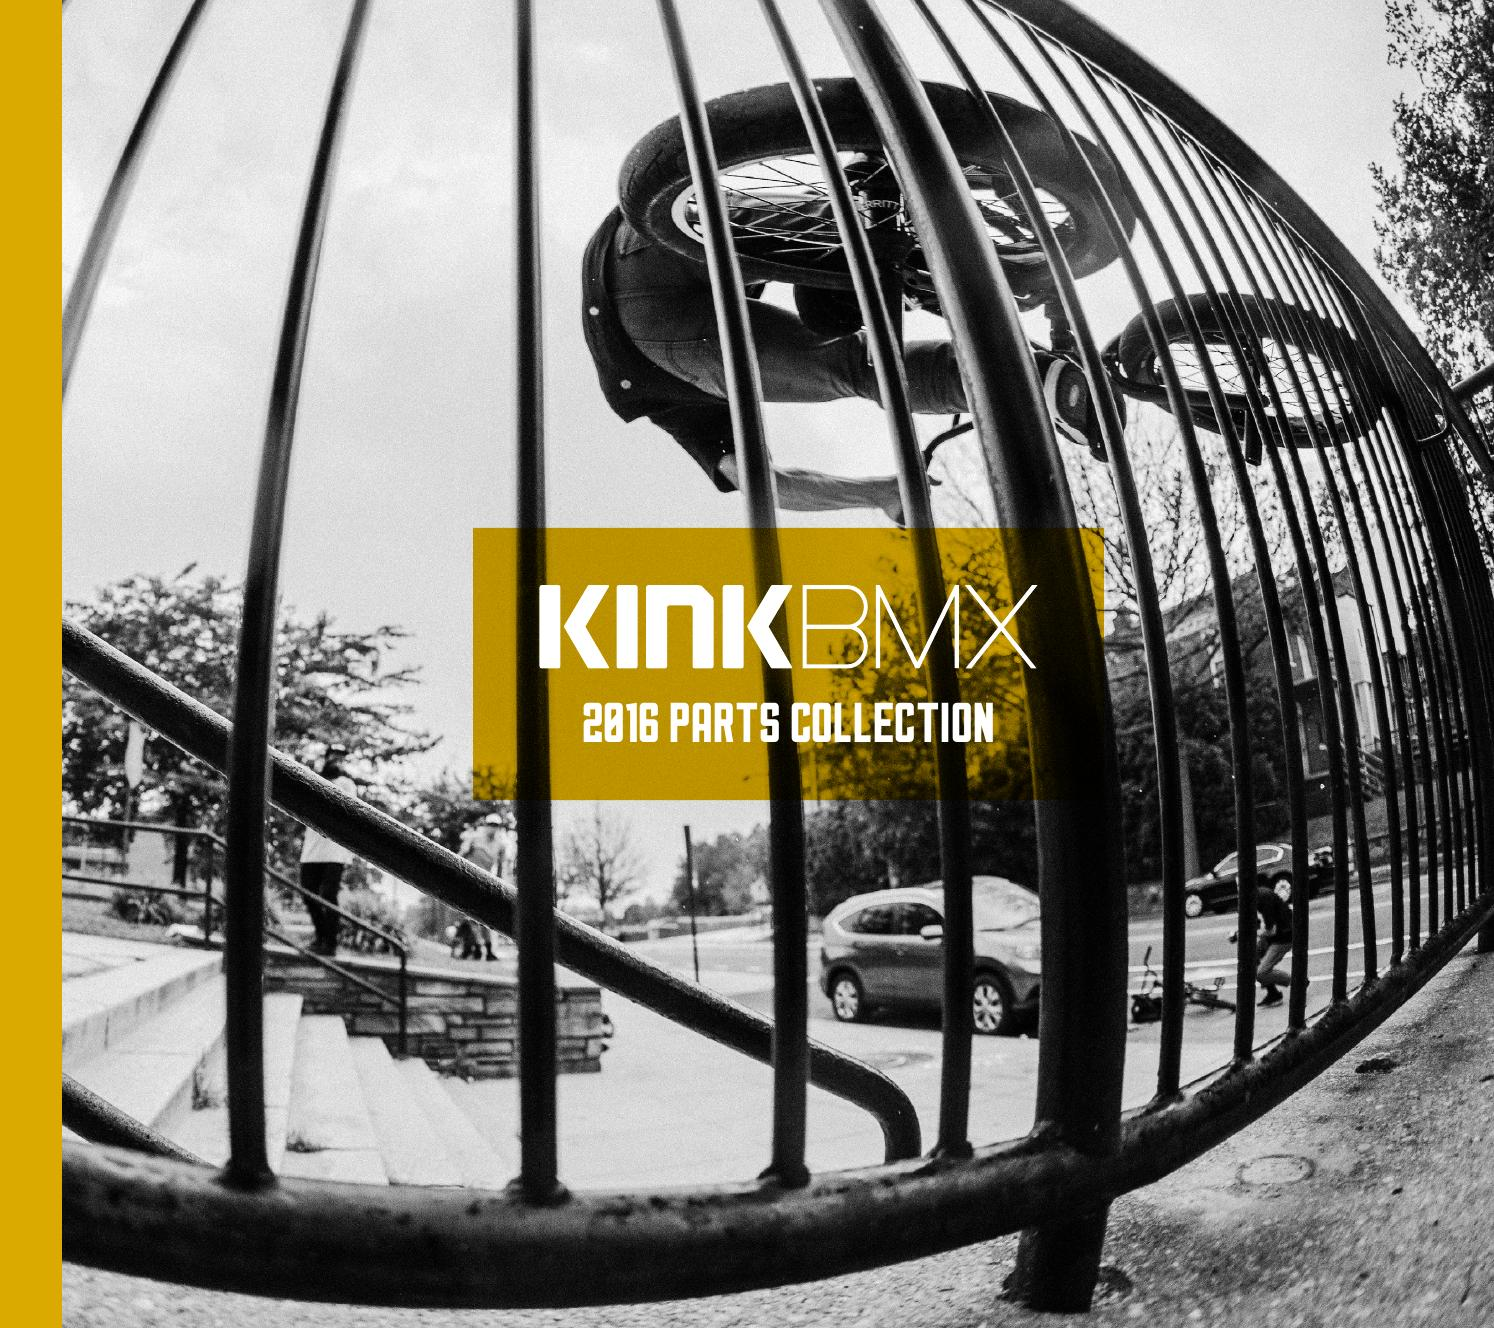 25.4mm x 330mm Kink BMX Large Stealth Pivotal Seat Post Matte Black